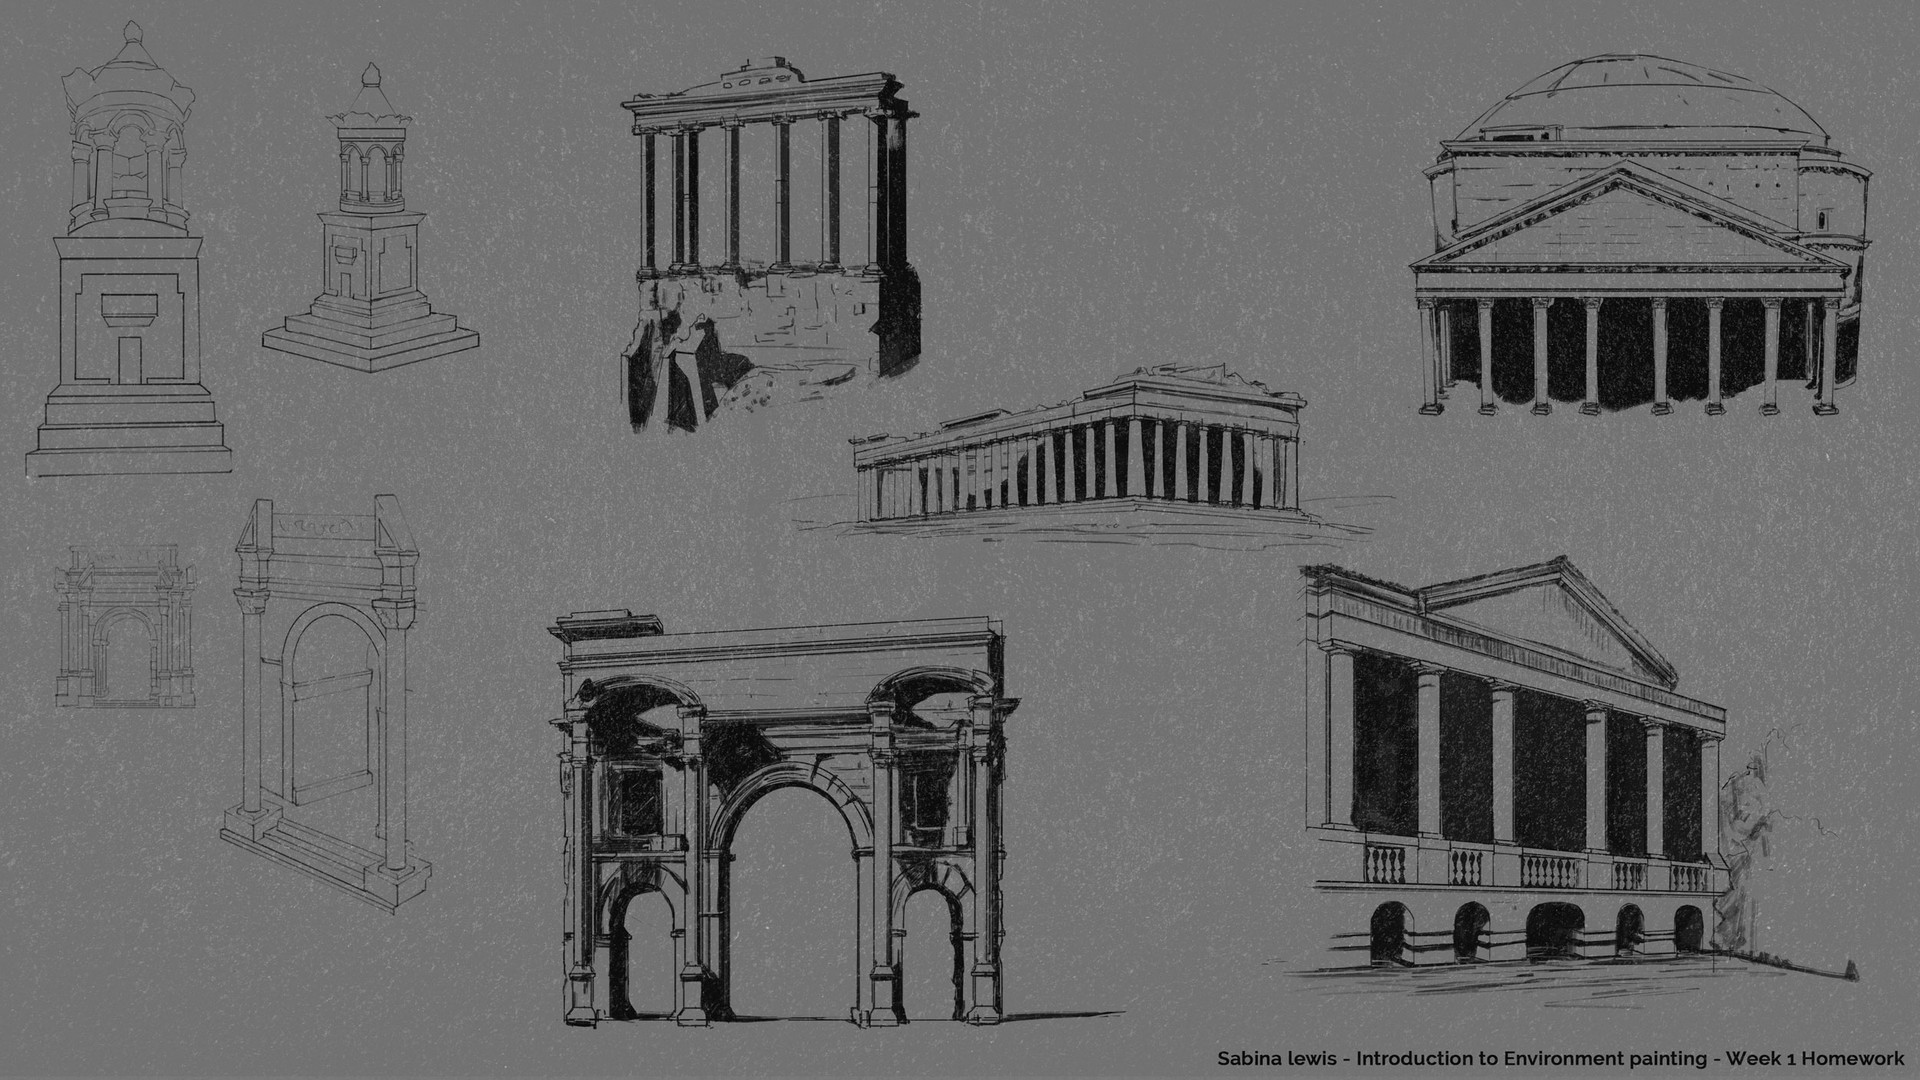 Sabina lewis les1 thumbnails sketchs roman 2400